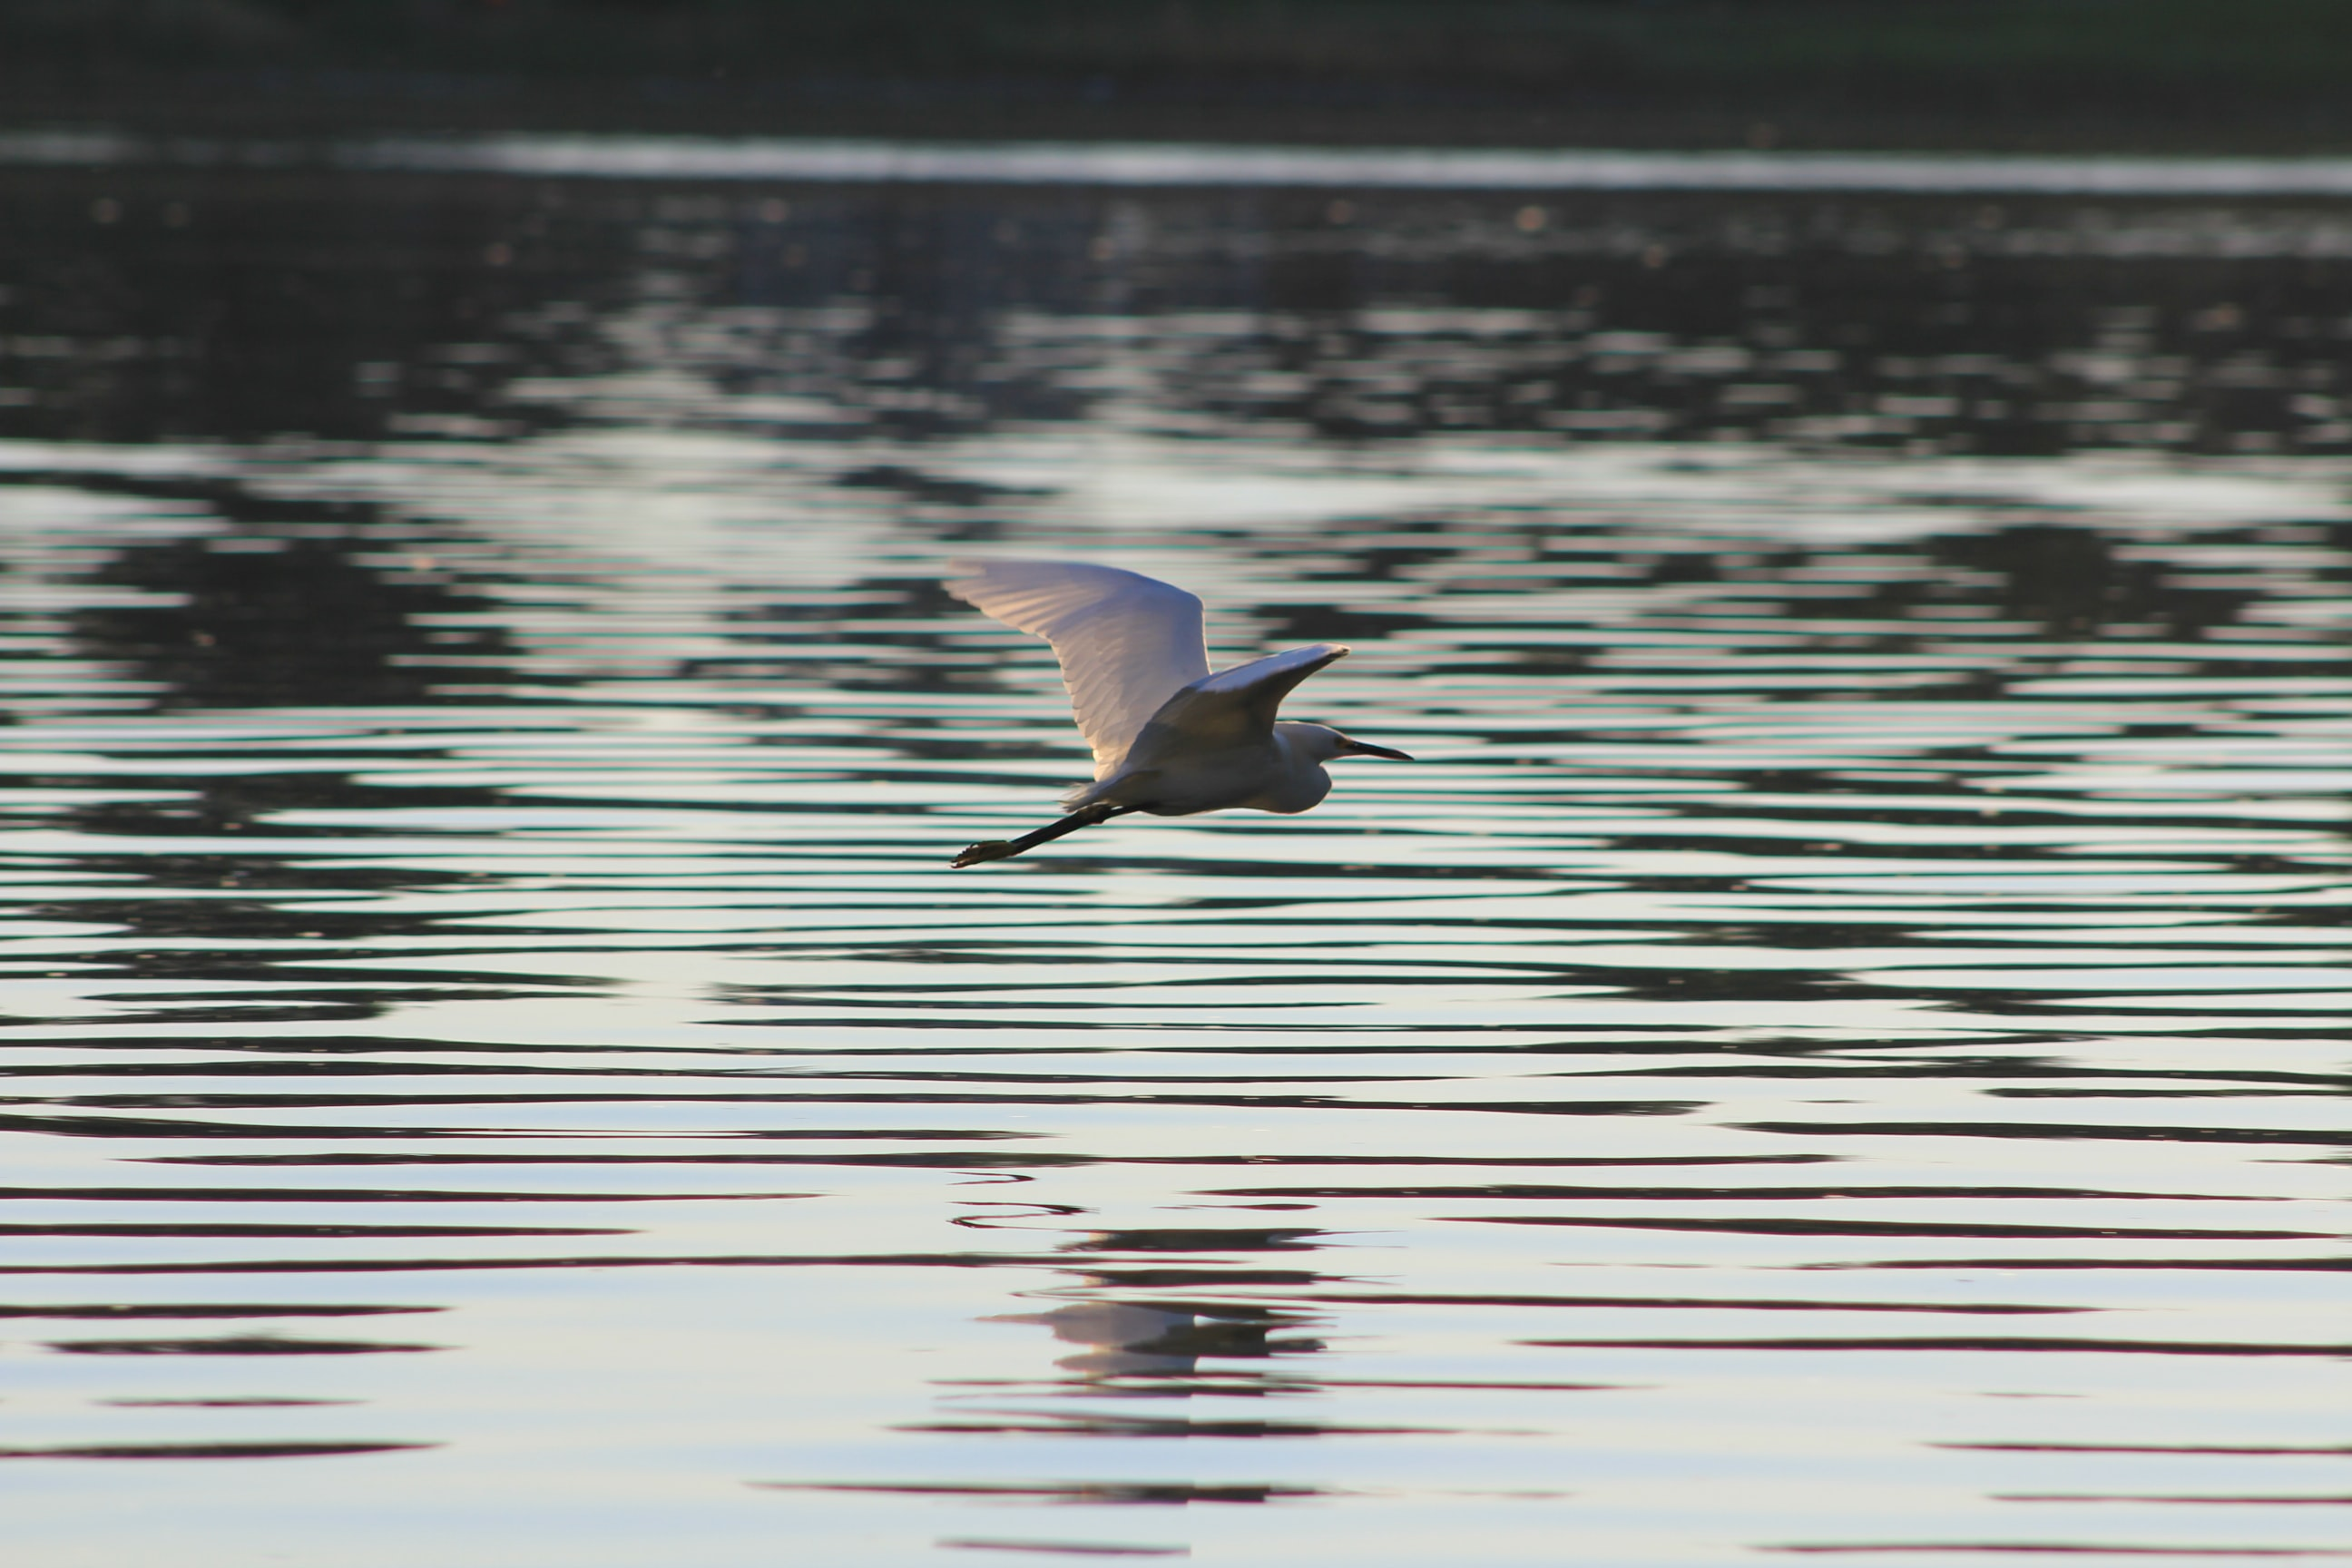 gray bird flying above body of water